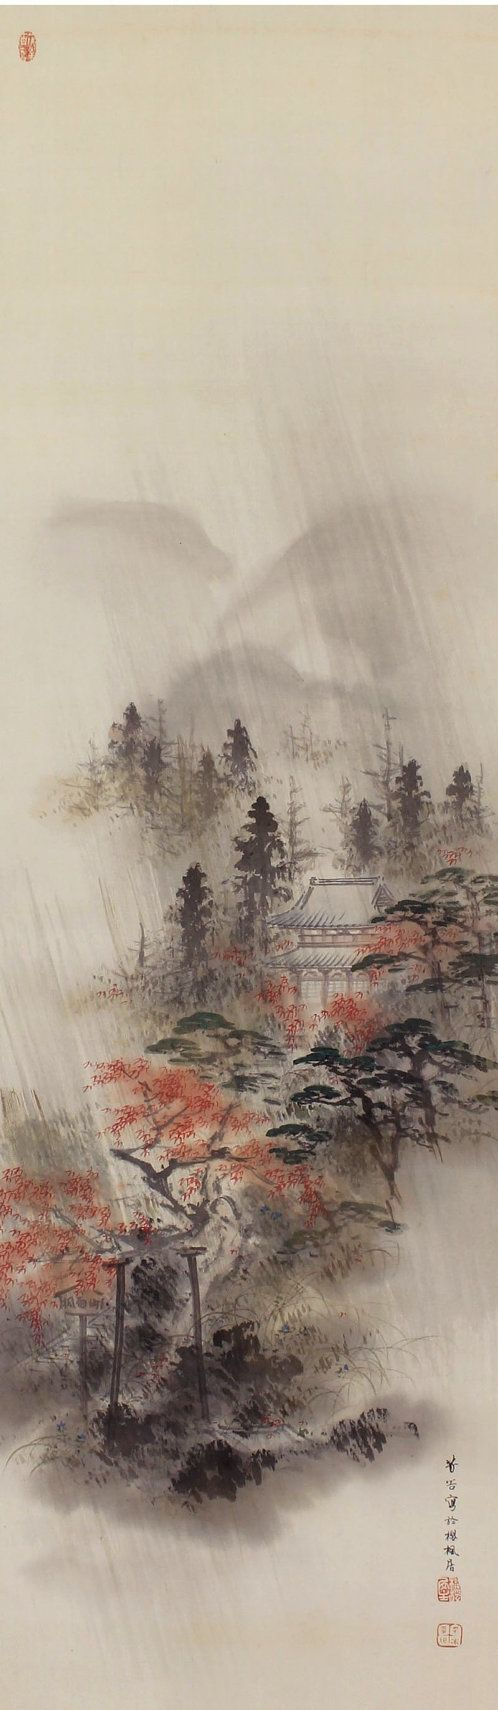 Best 25 japanese wall art ideas on pinterest almond blossom japanese fine art wall hanging scroll painting sakuraantiques amipublicfo Gallery